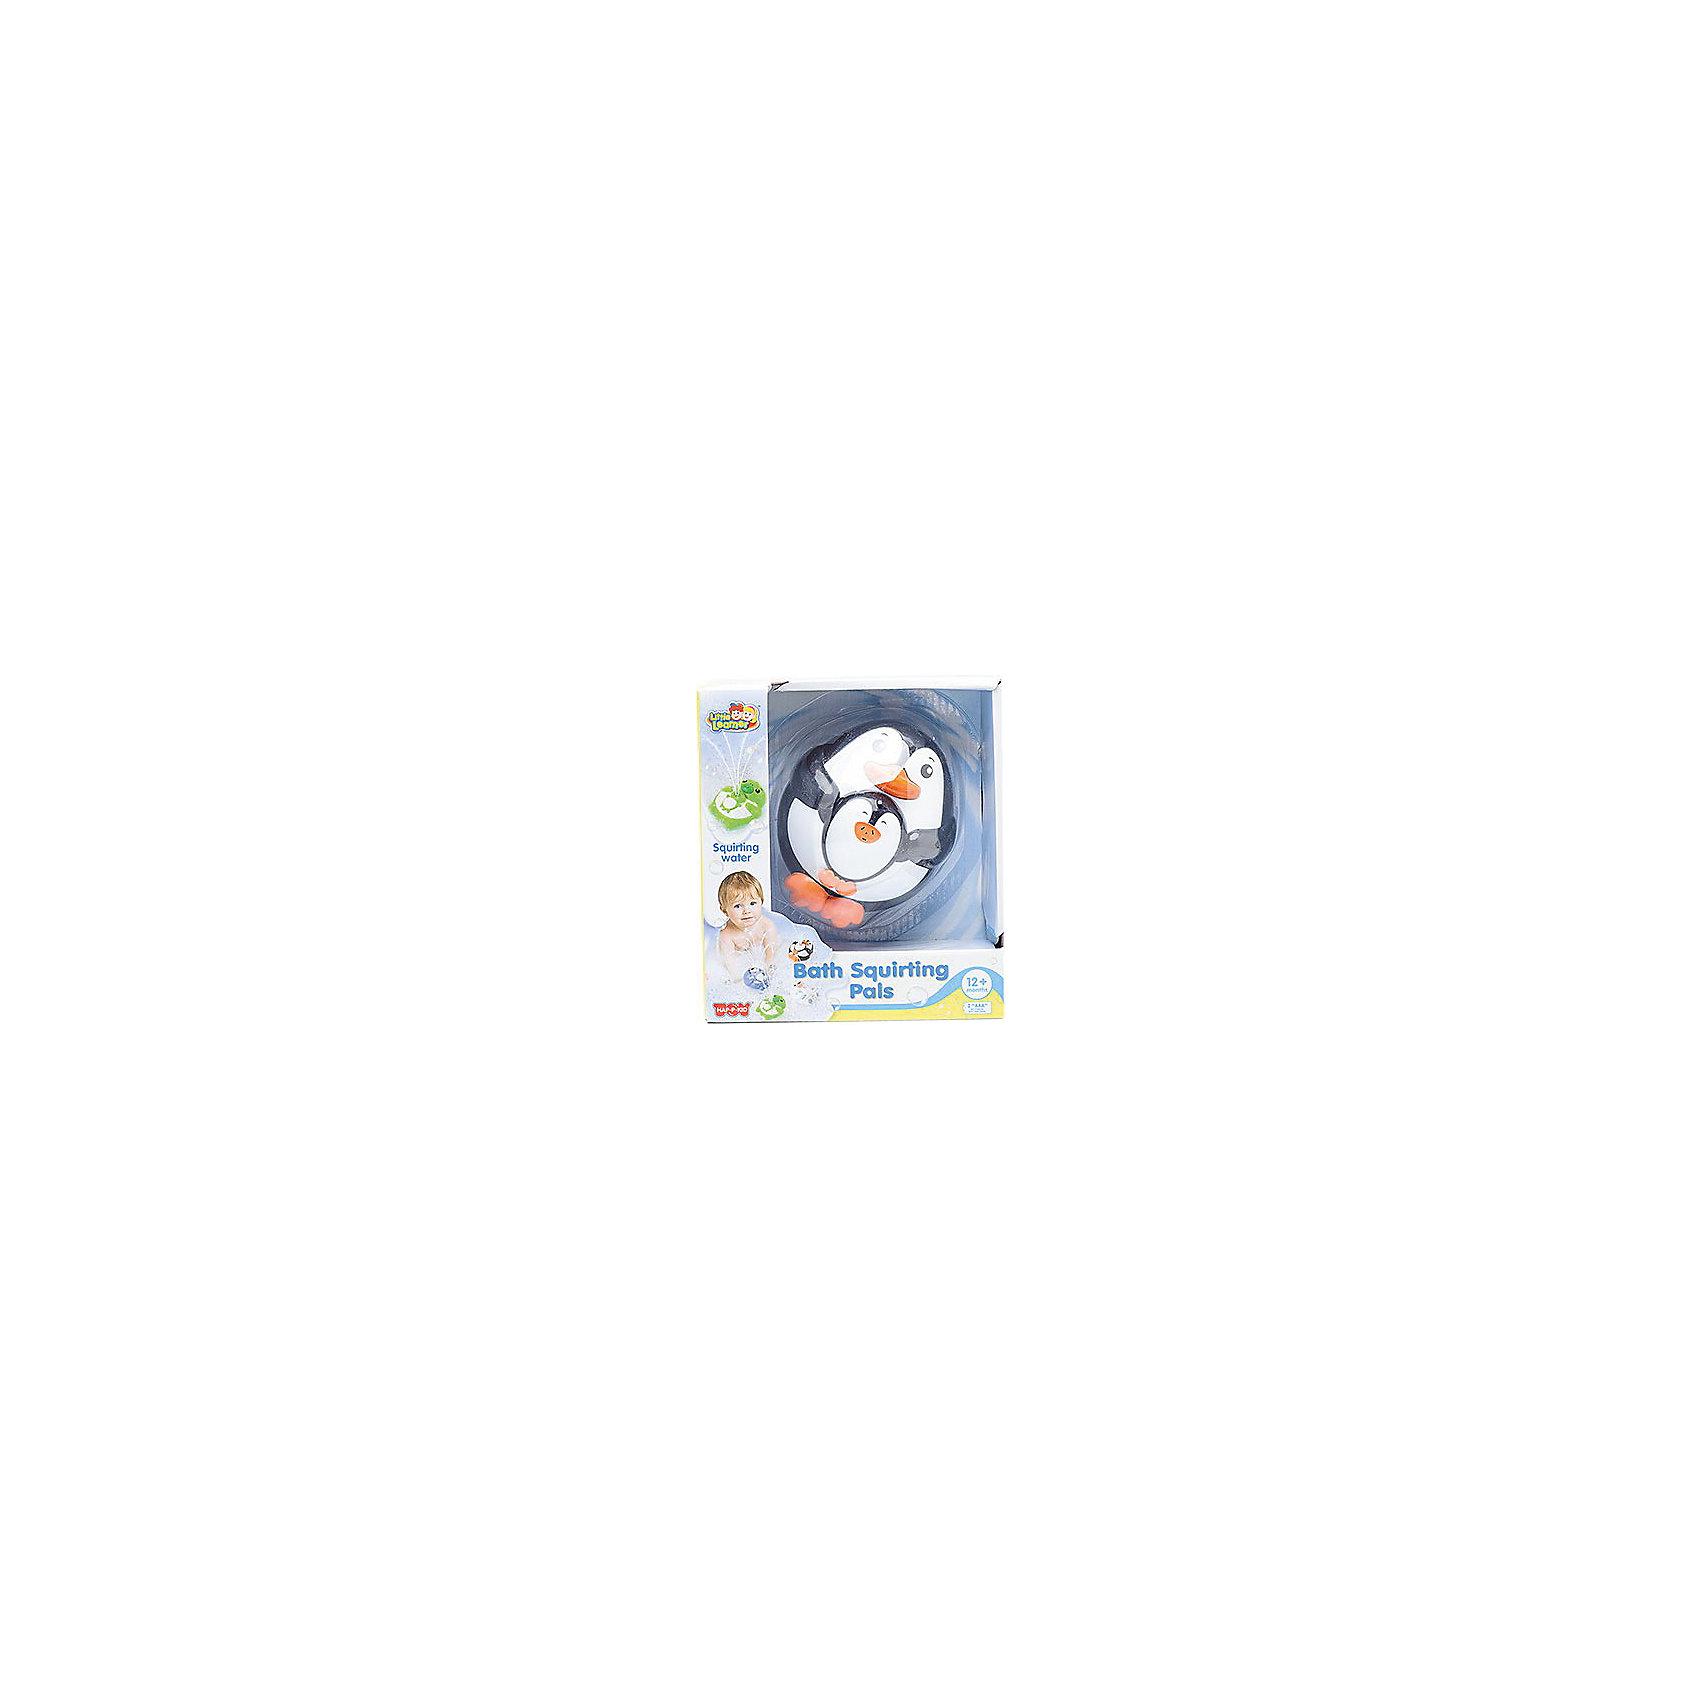 HAP-P-KID Игрушка для ванной Пингвиненок, HAP-P-KID фигурки игрушки hap p kid пингвиненок на катере